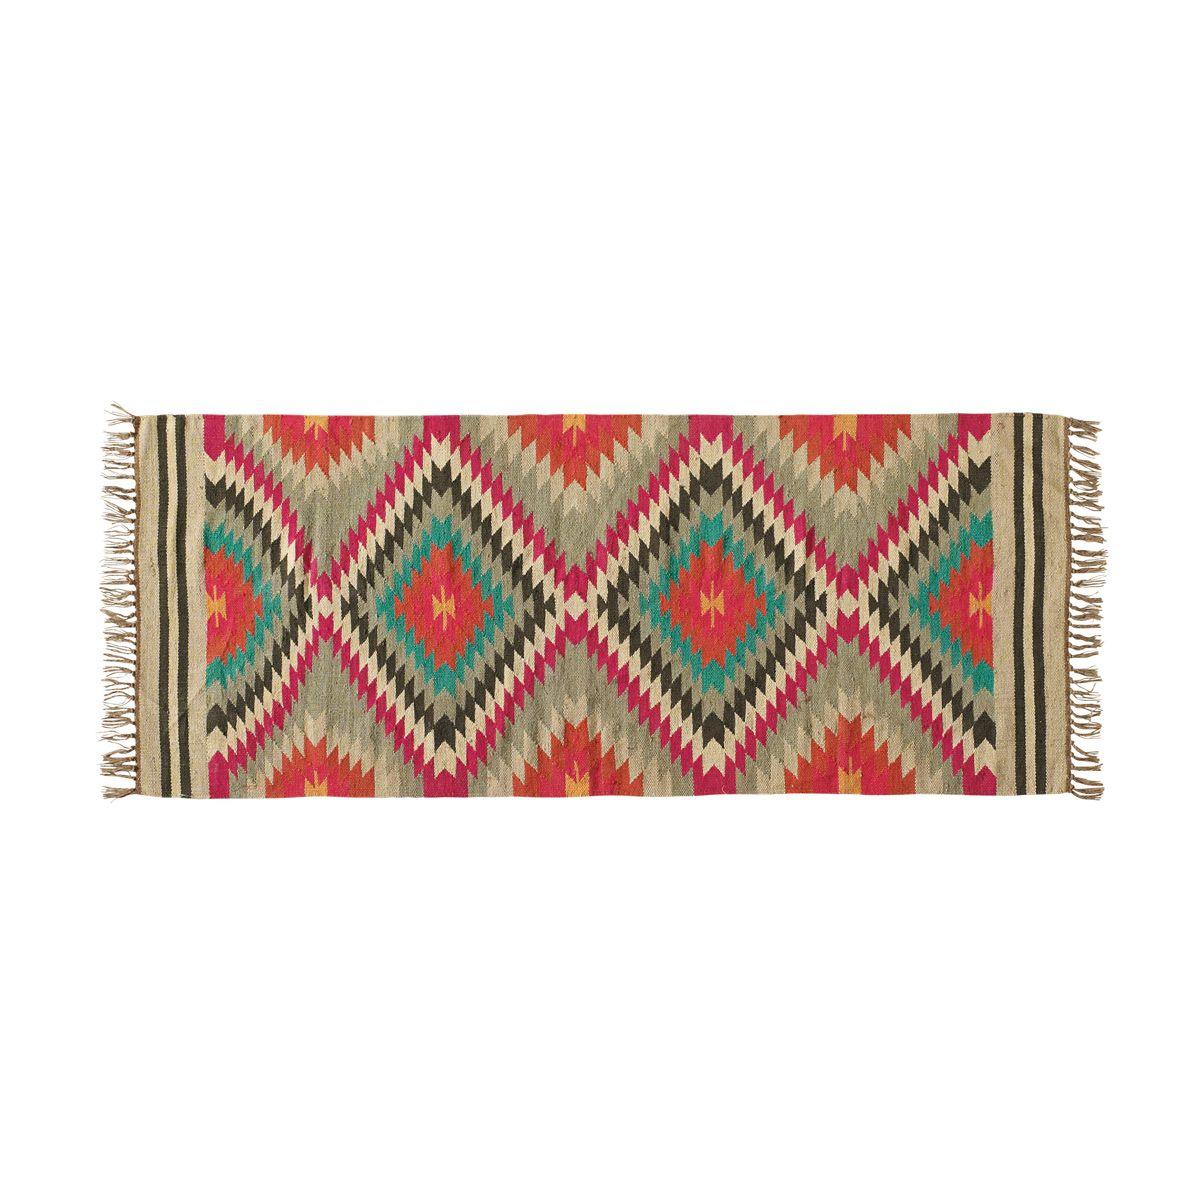 ACAPULCO woollen woven rug, multicoloured 80 x 200cm | Maisons du ...